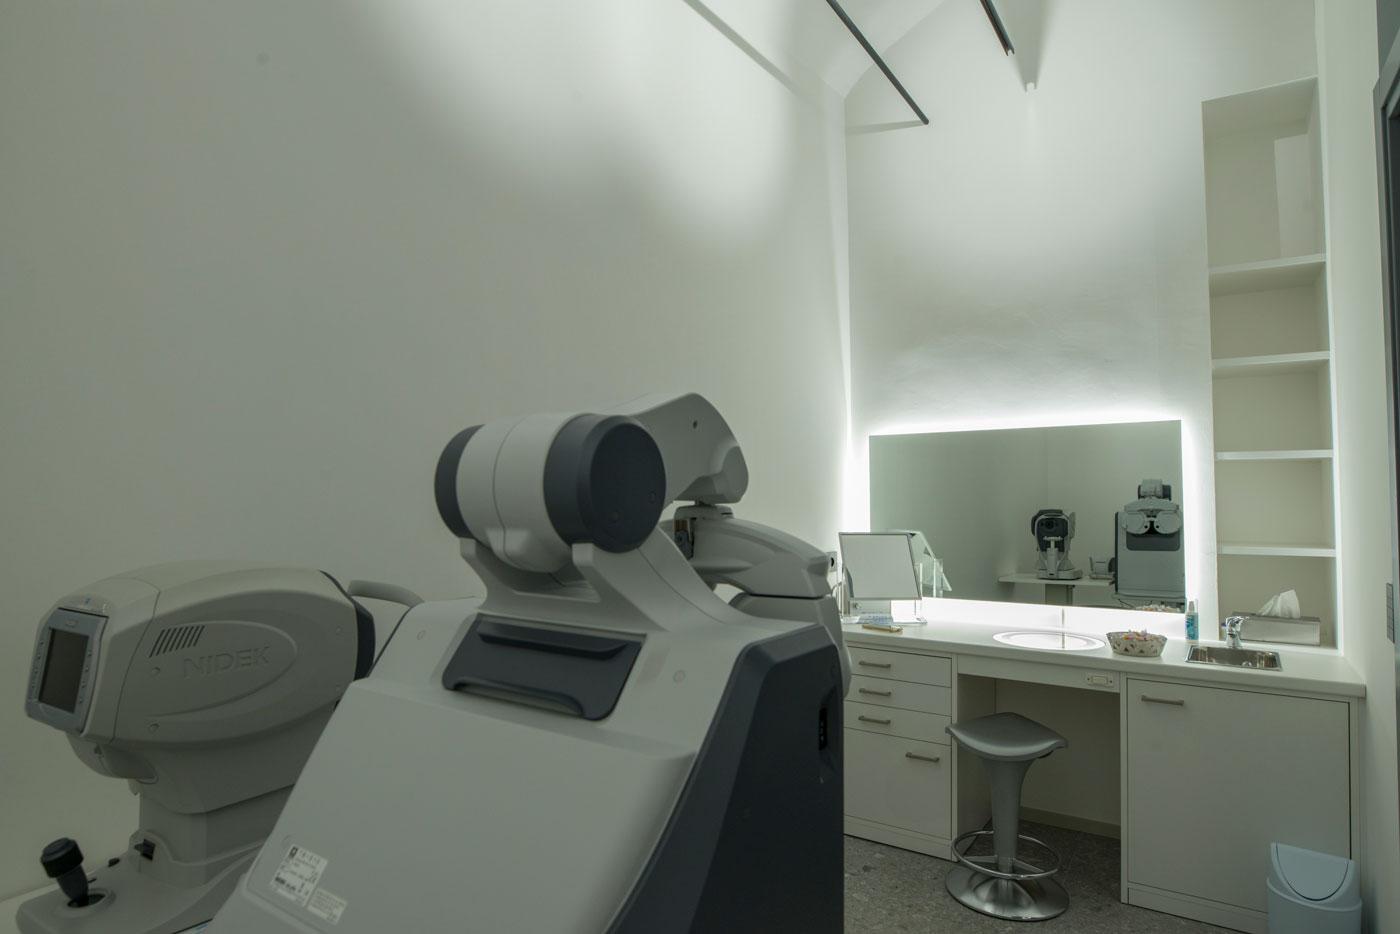 lab-centro-ottico-emmedue-spoleto-13